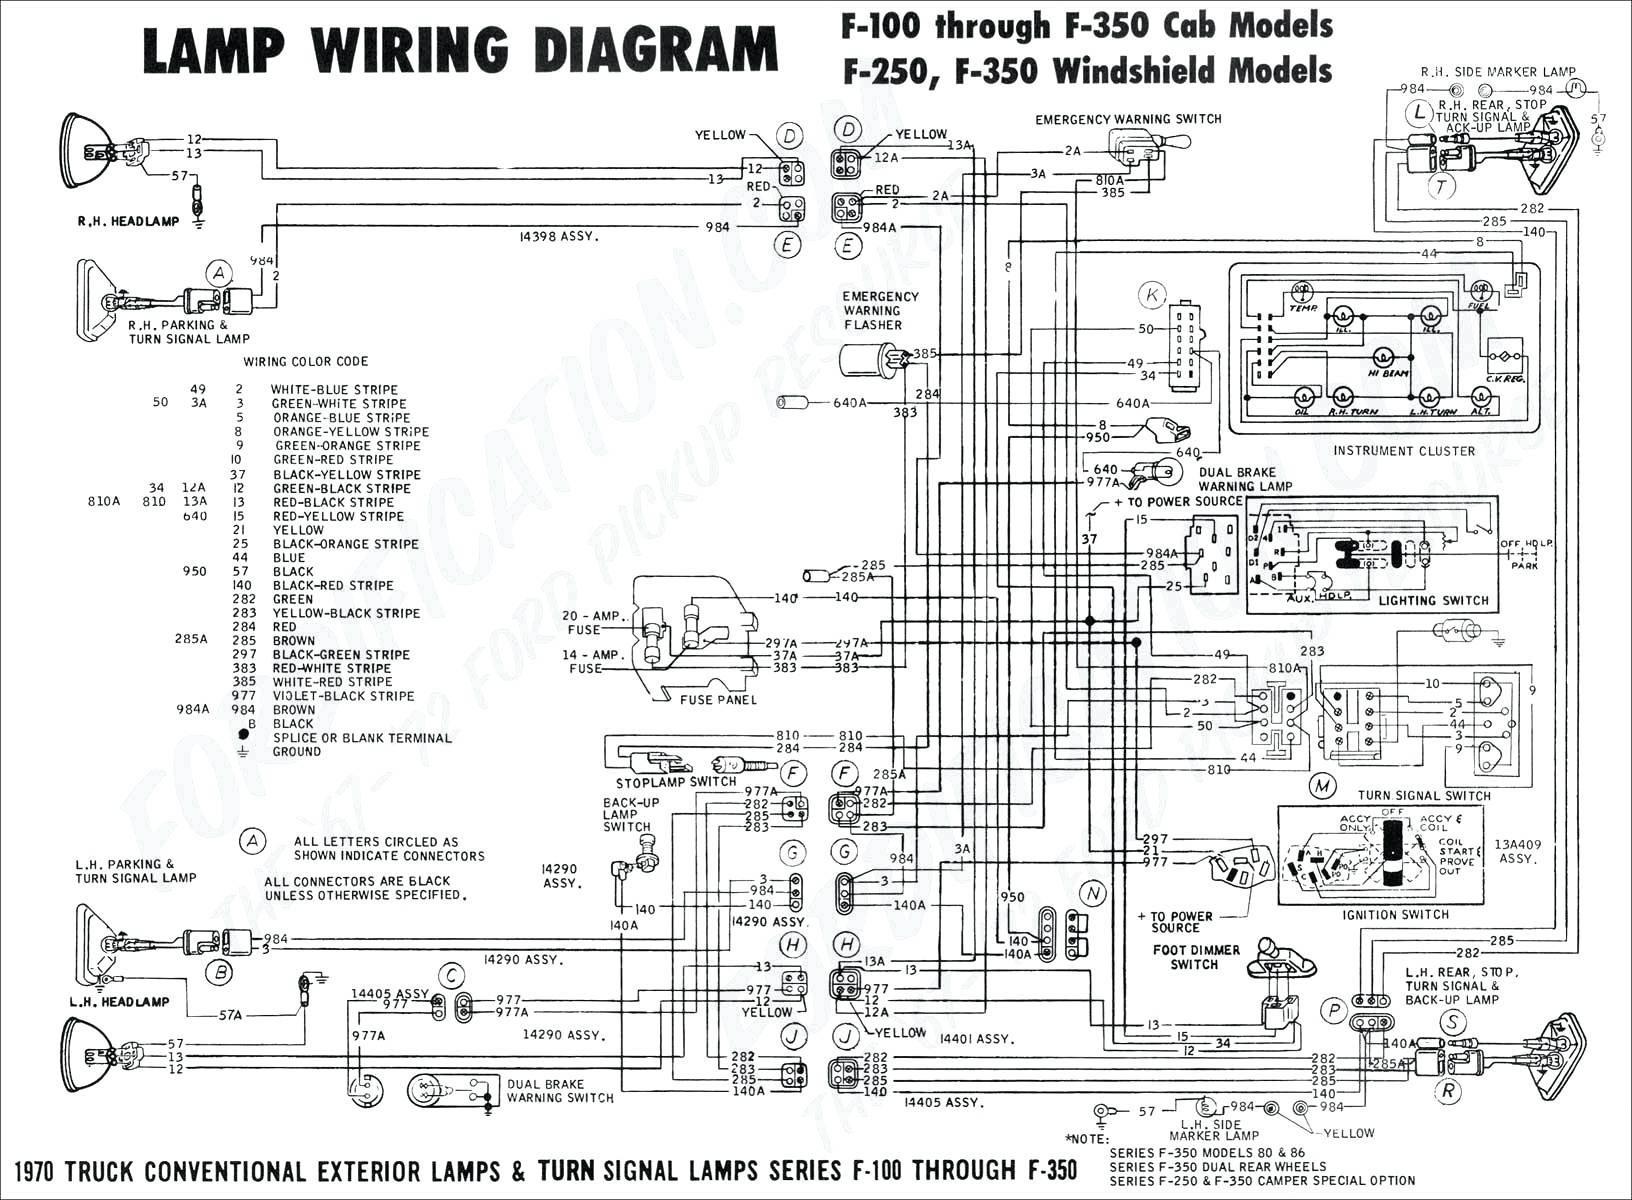 Truck to Trailer Wiring Diagram Chevy Silverado Wiring Diagram for 1997 Best Truck Radio Suburban Of Truck to Trailer Wiring Diagram 60 Lovely Wiring Diagram for Gmc Trailer Plug